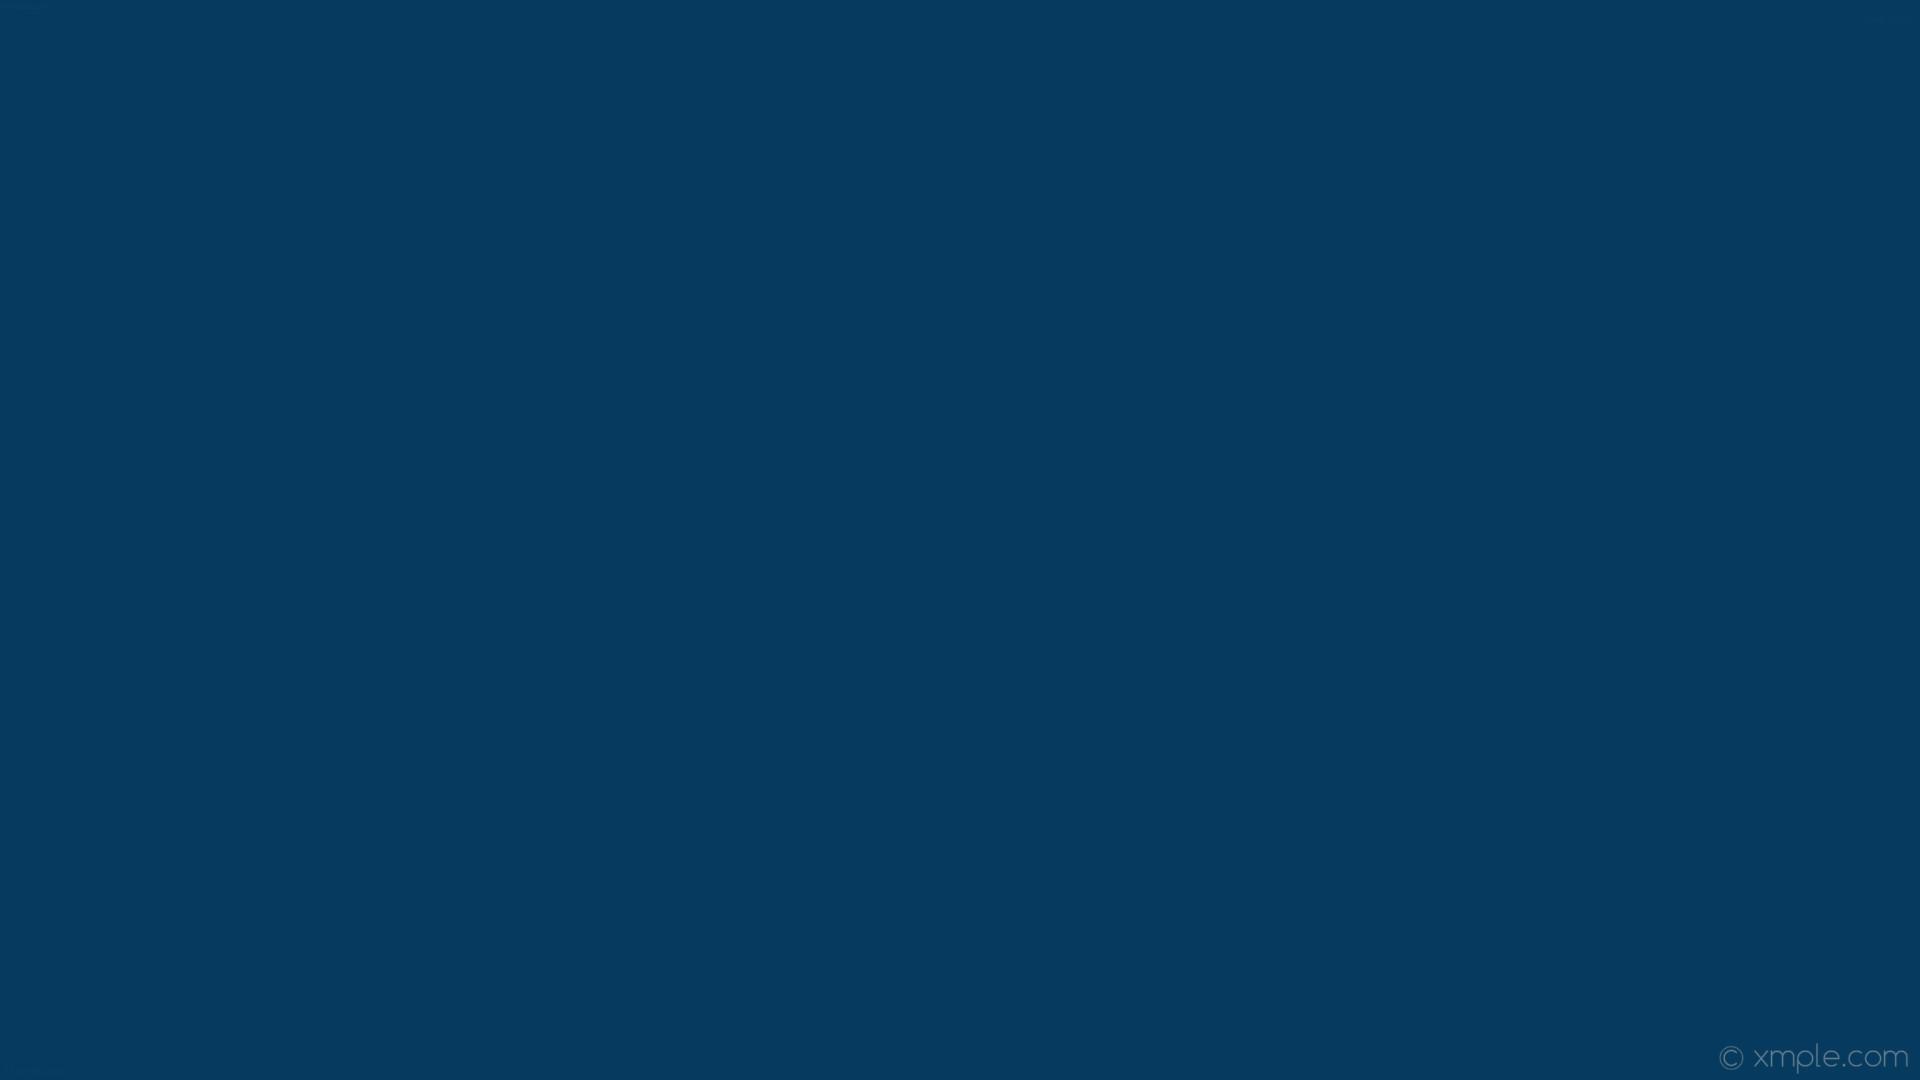 wallpaper single one colour solid color azure plain dark azure #063b5f